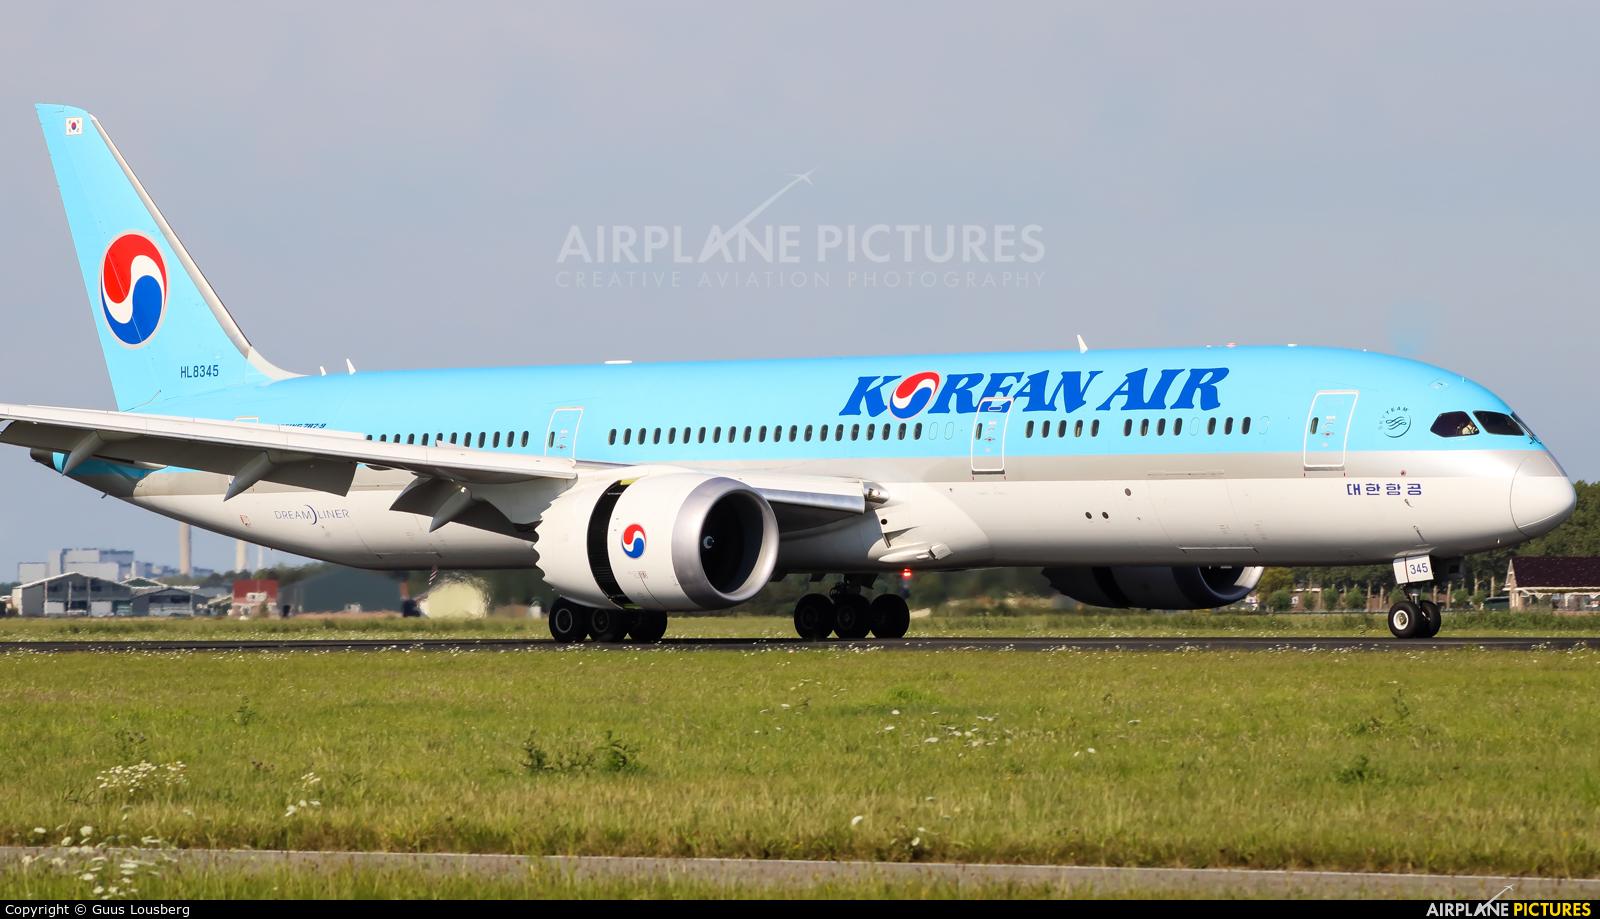 Korean Air HL8345 aircraft at Amsterdam - Schiphol